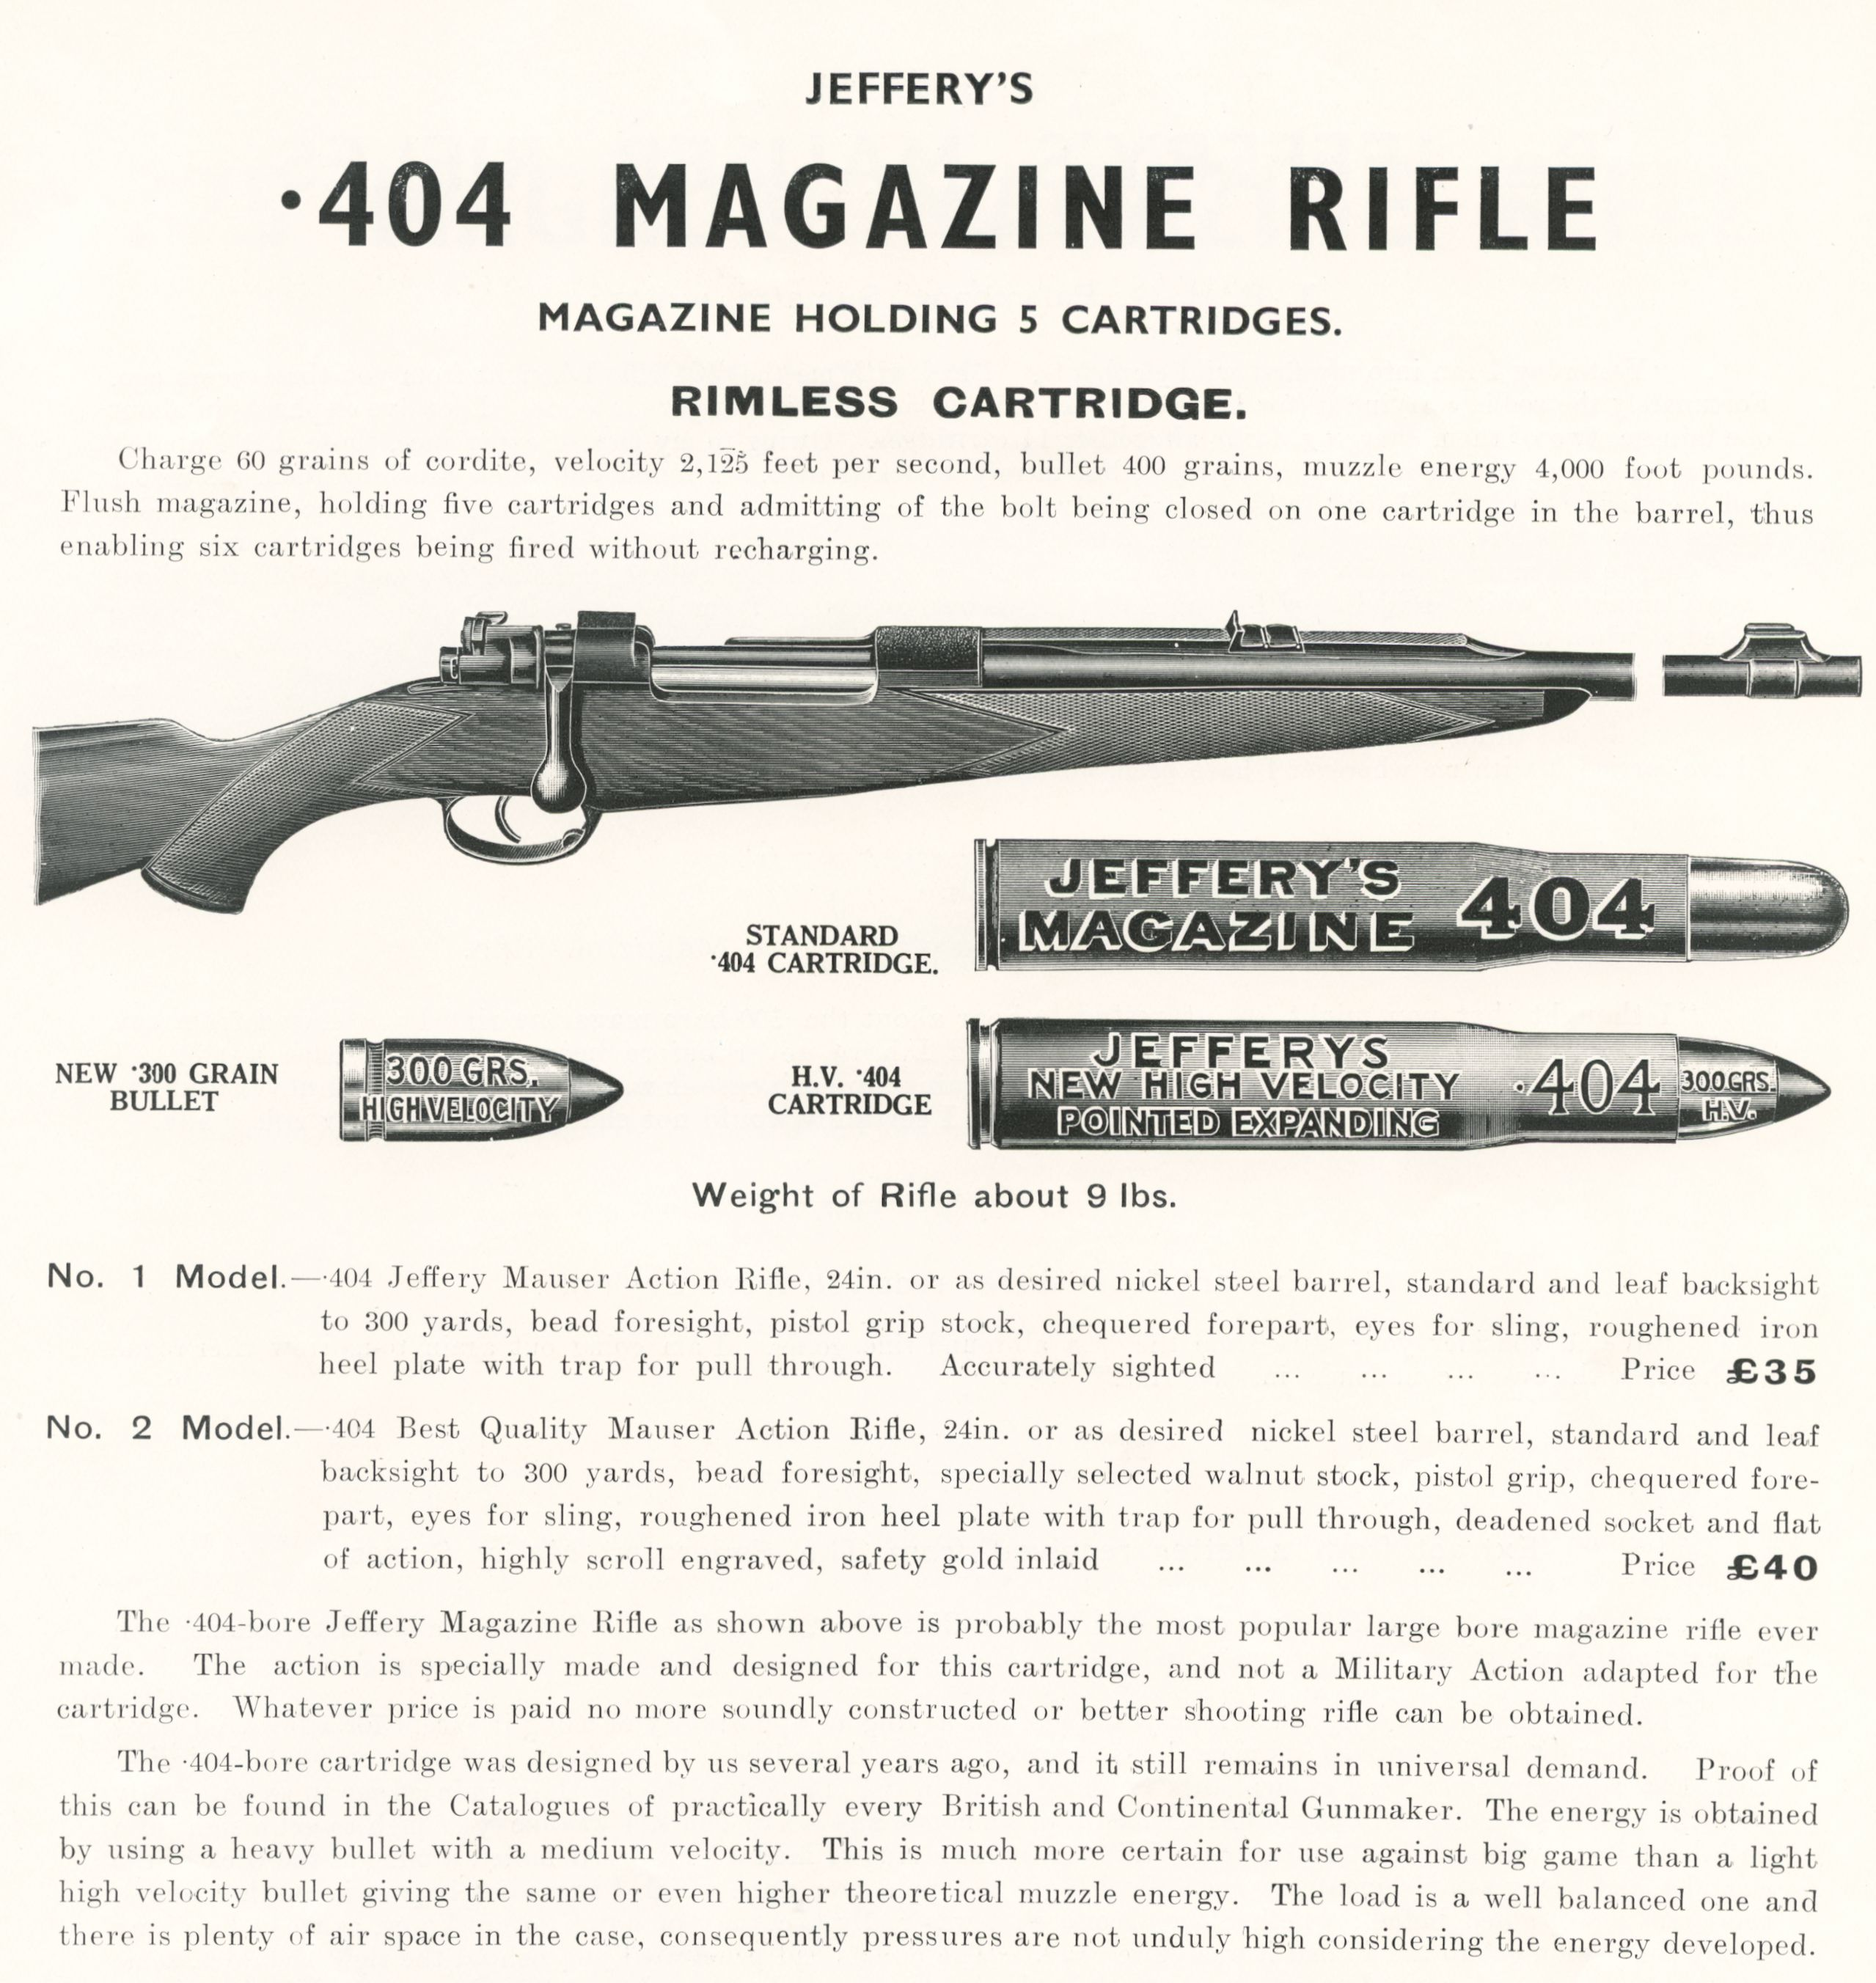 404 Jeffery from Catalogue.